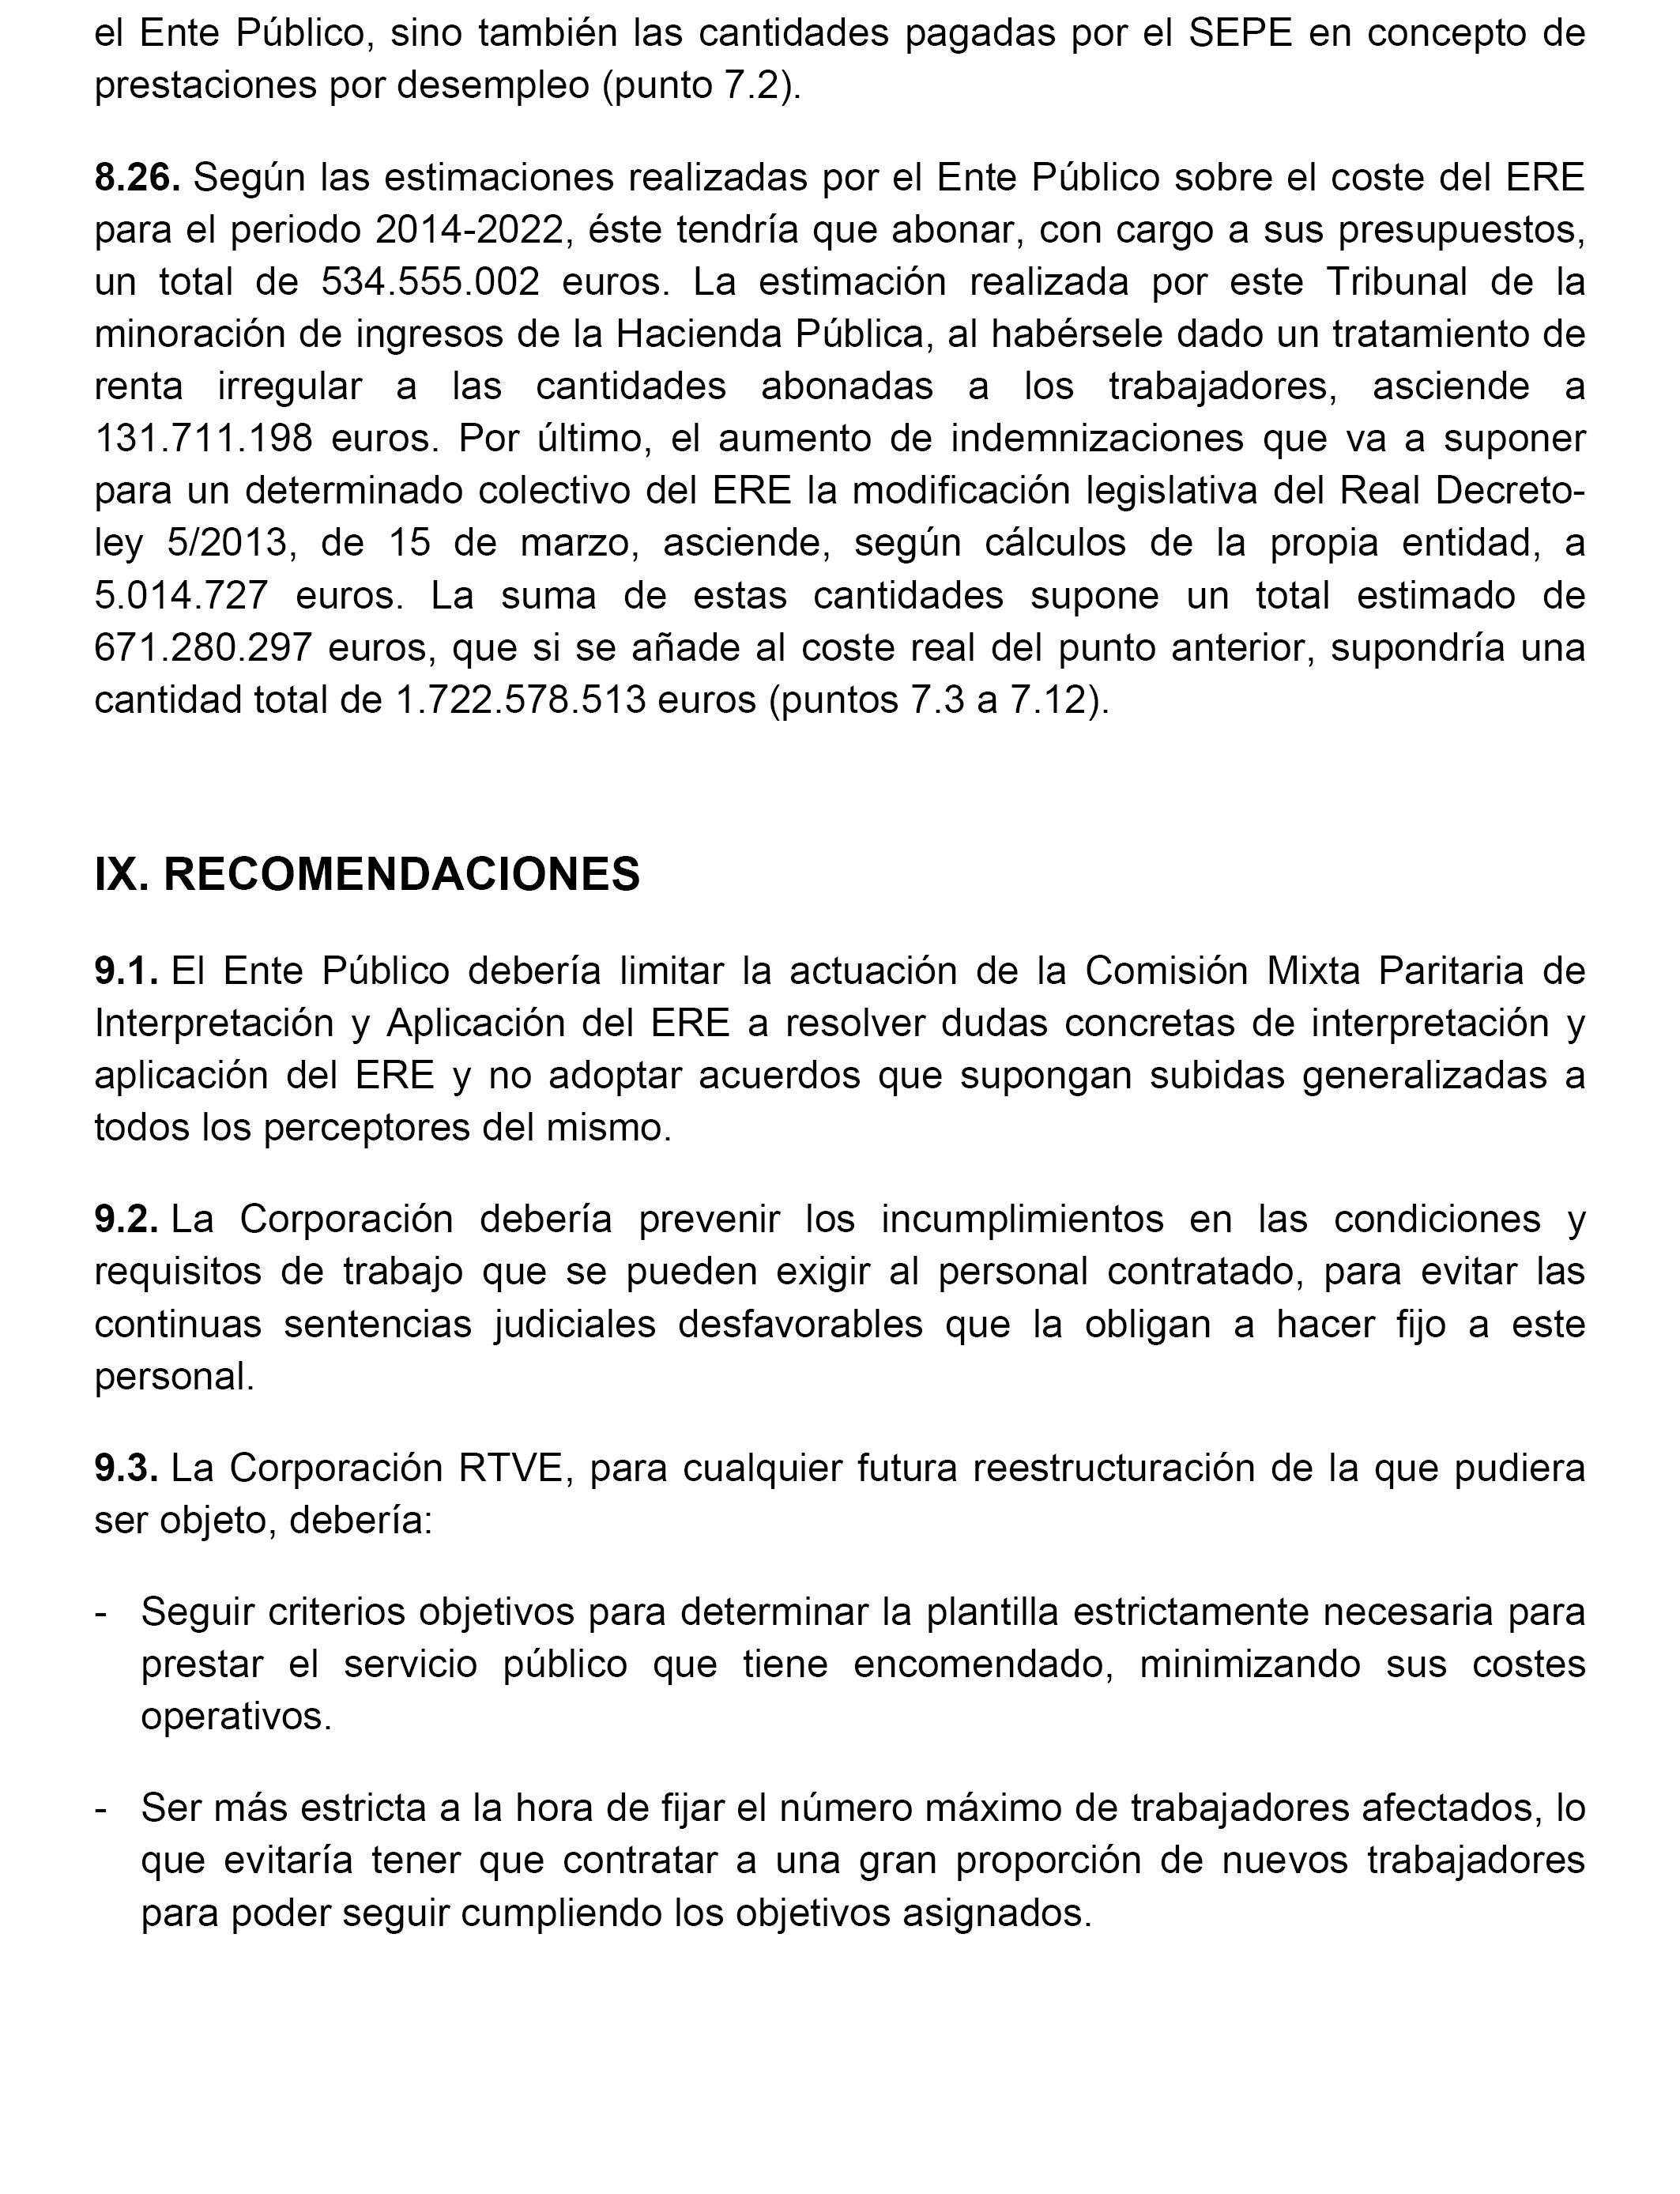 BOE.es - Documento BOE-A-2018-572